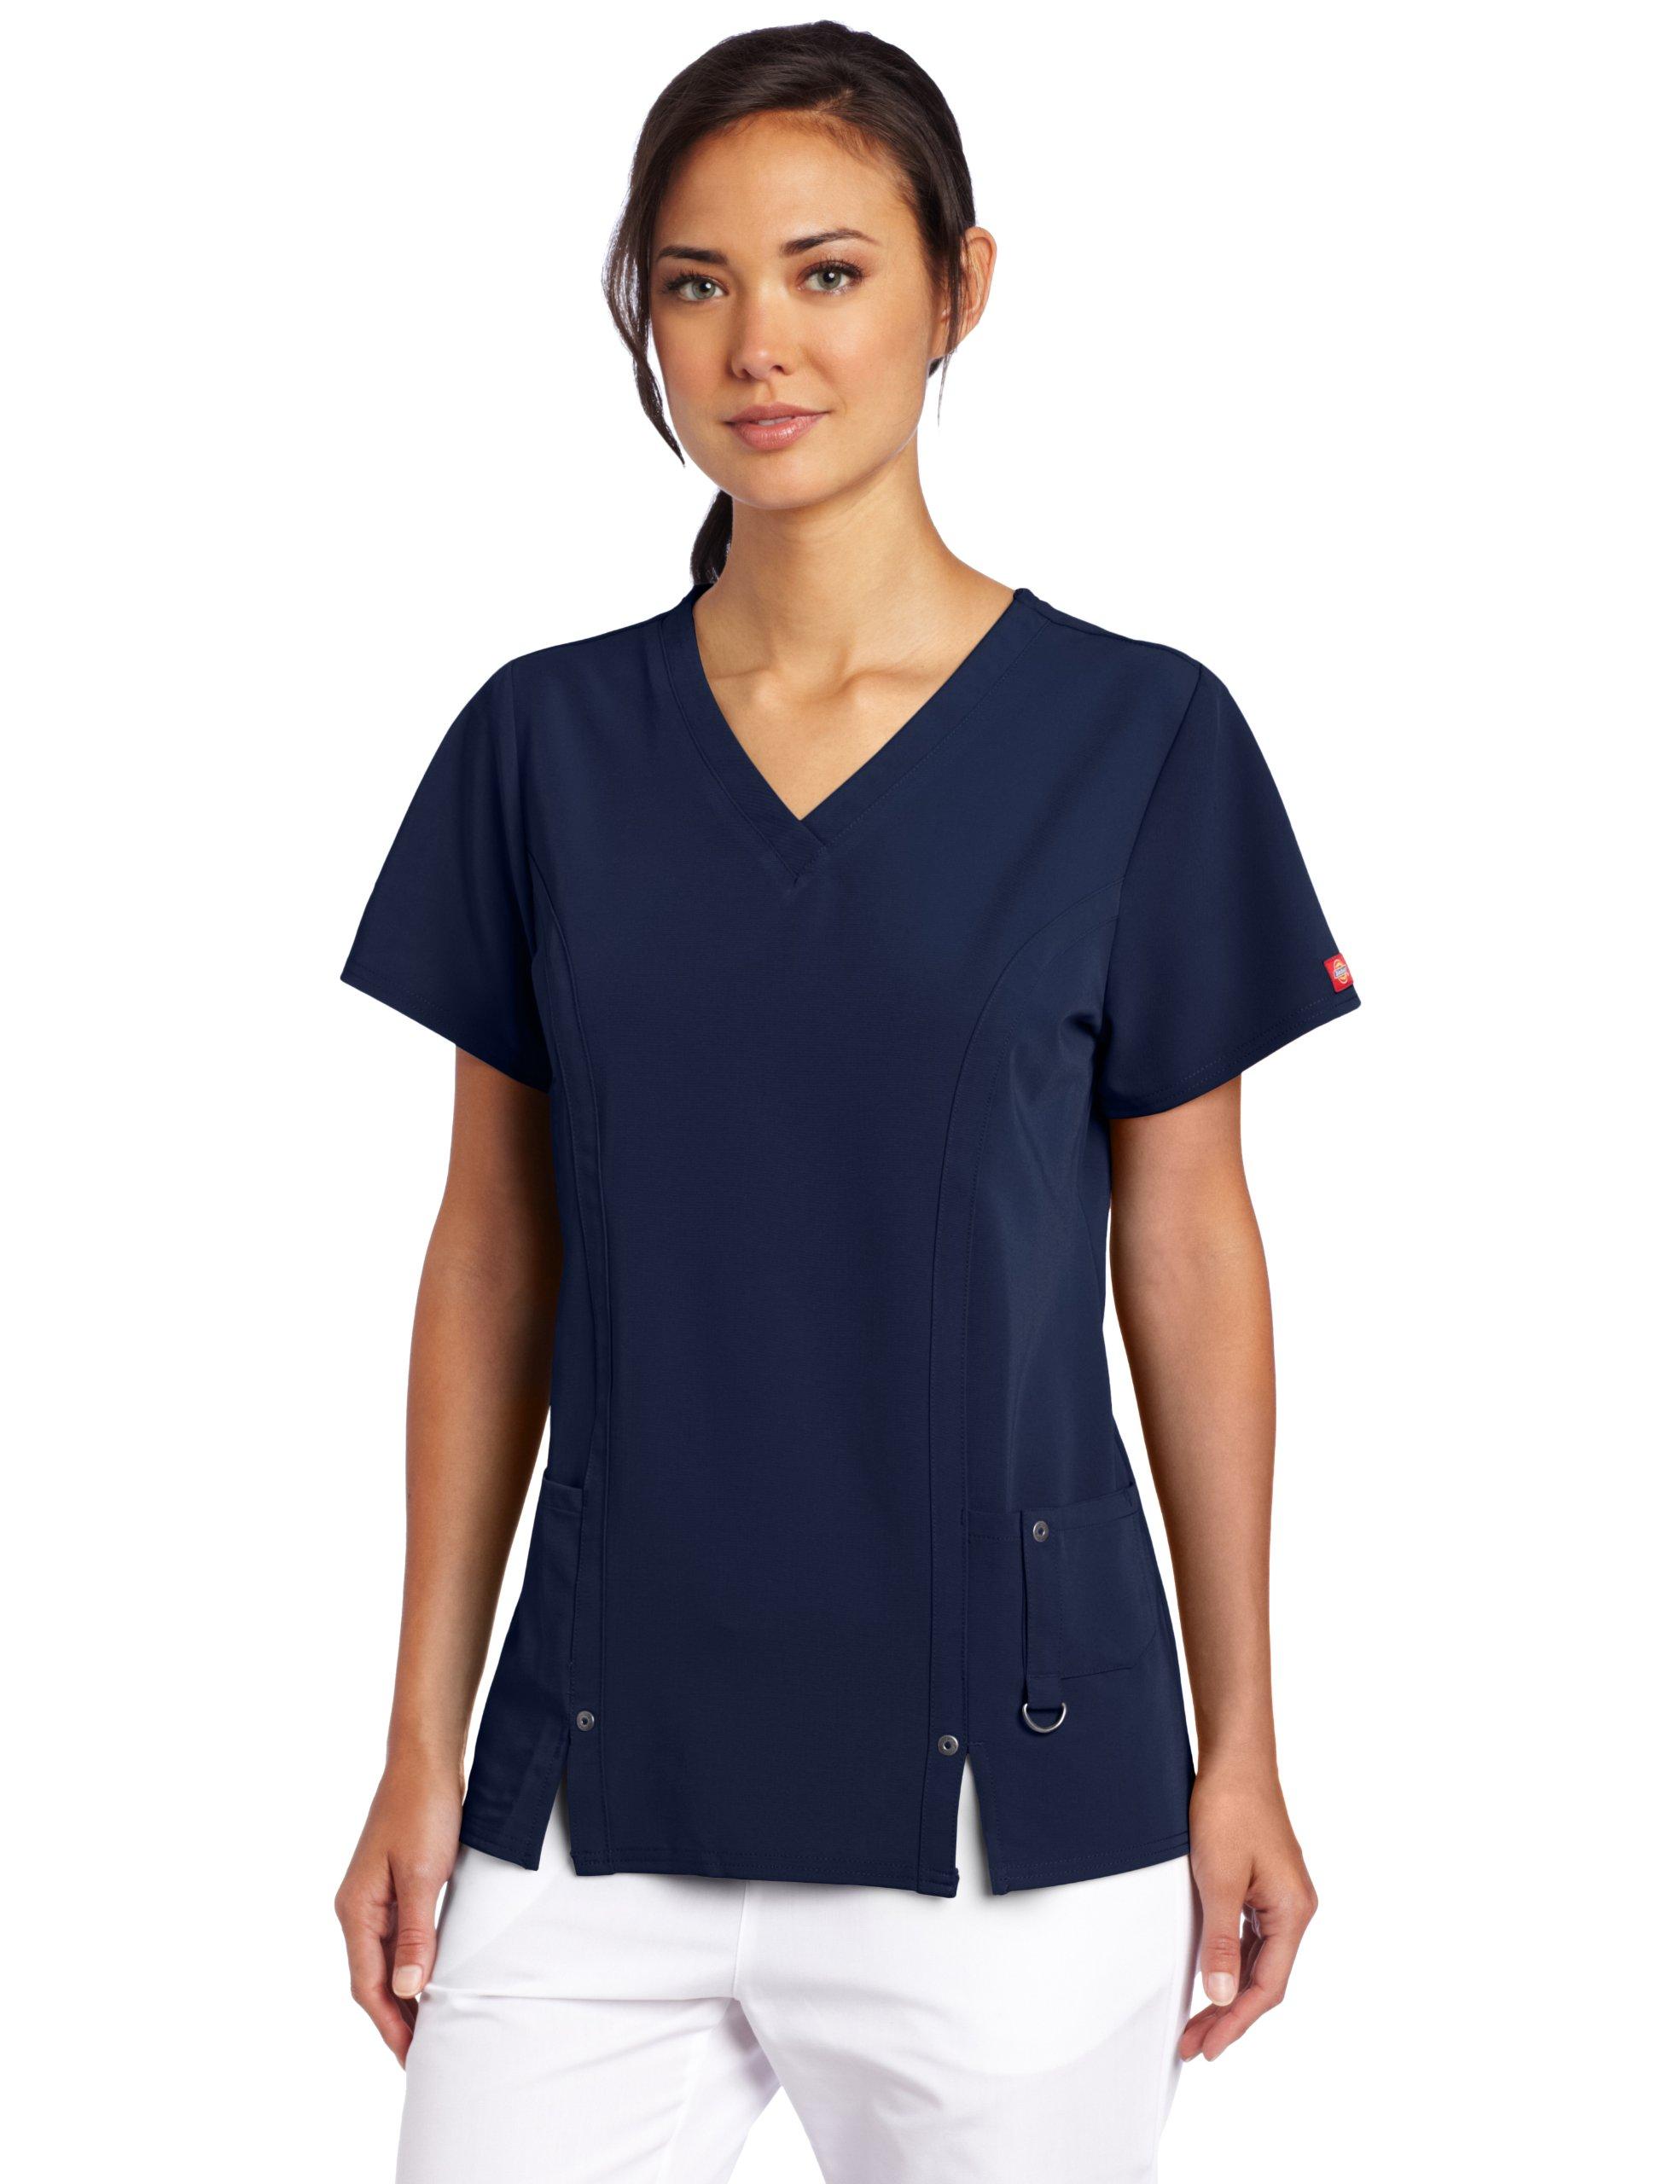 Dickies Scrubs Women's Xtreme Stretch Junior Fit V-Neck Shirt, Navy, Large